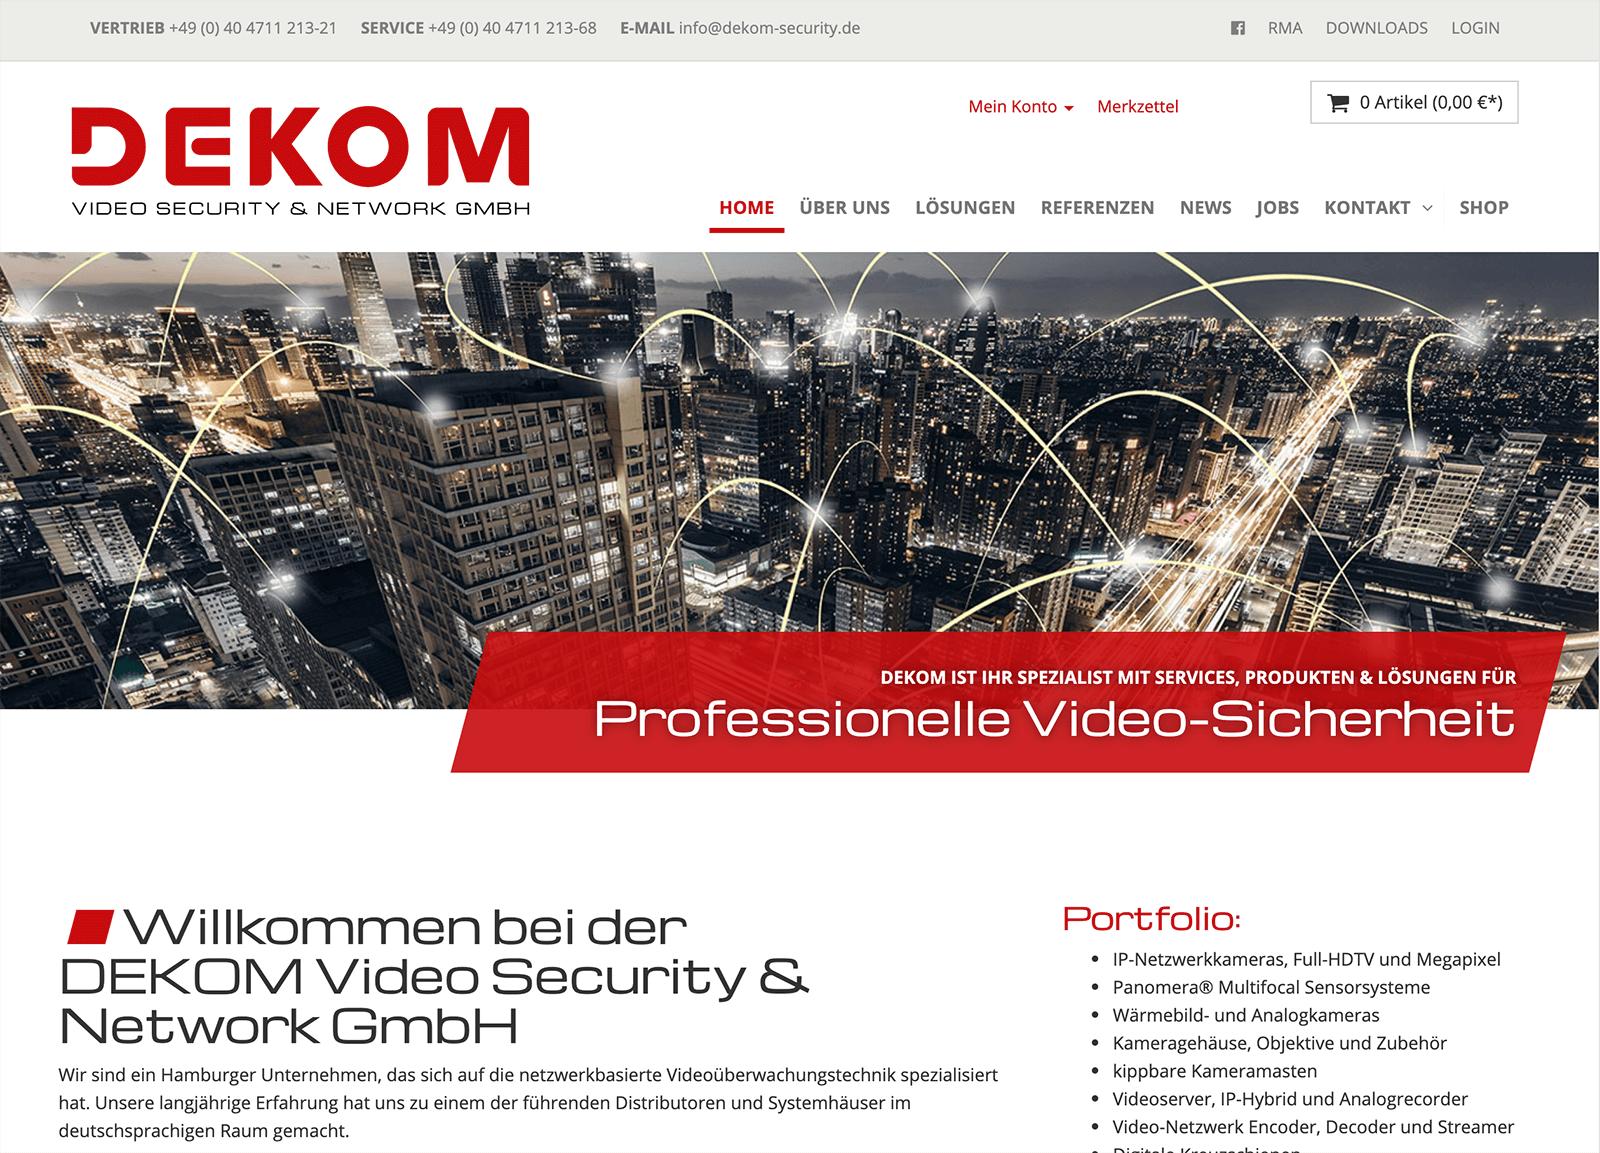 Shopware sowie Anbindung an Microsoft Dynamics/Navision für Dekom Security Network/Dallmeier